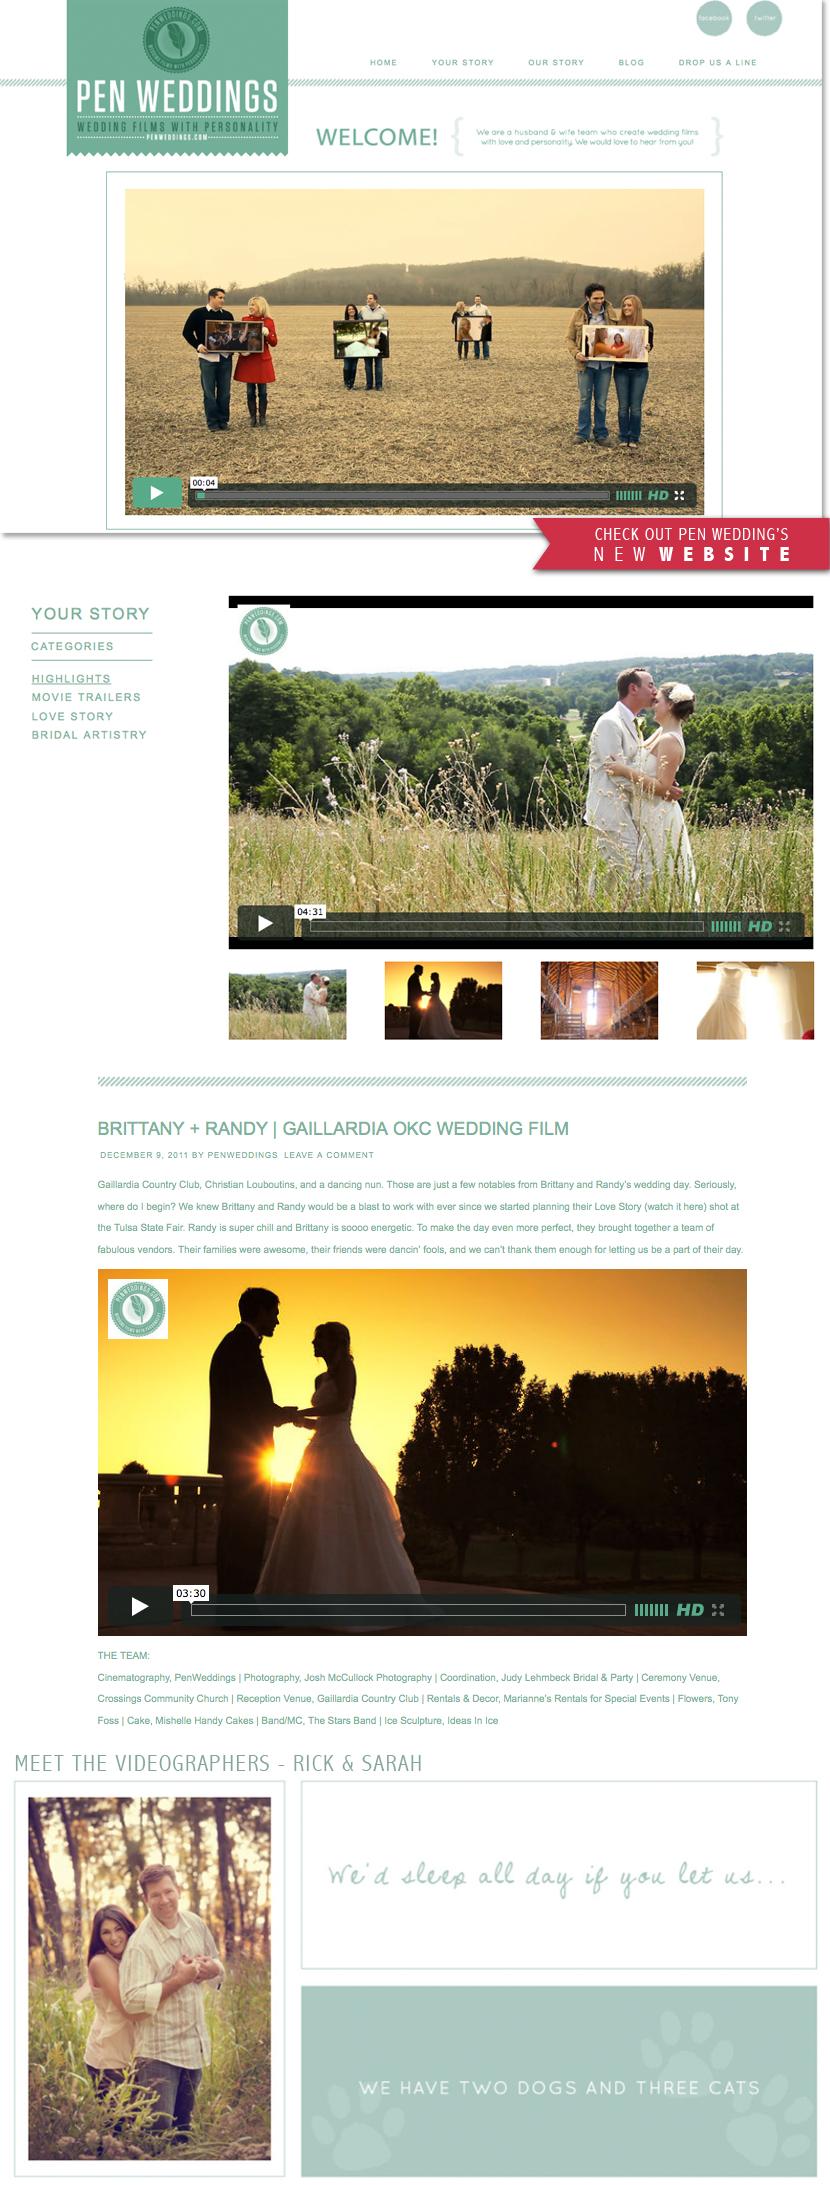 Oklahoma wedding videography Pen Weddings